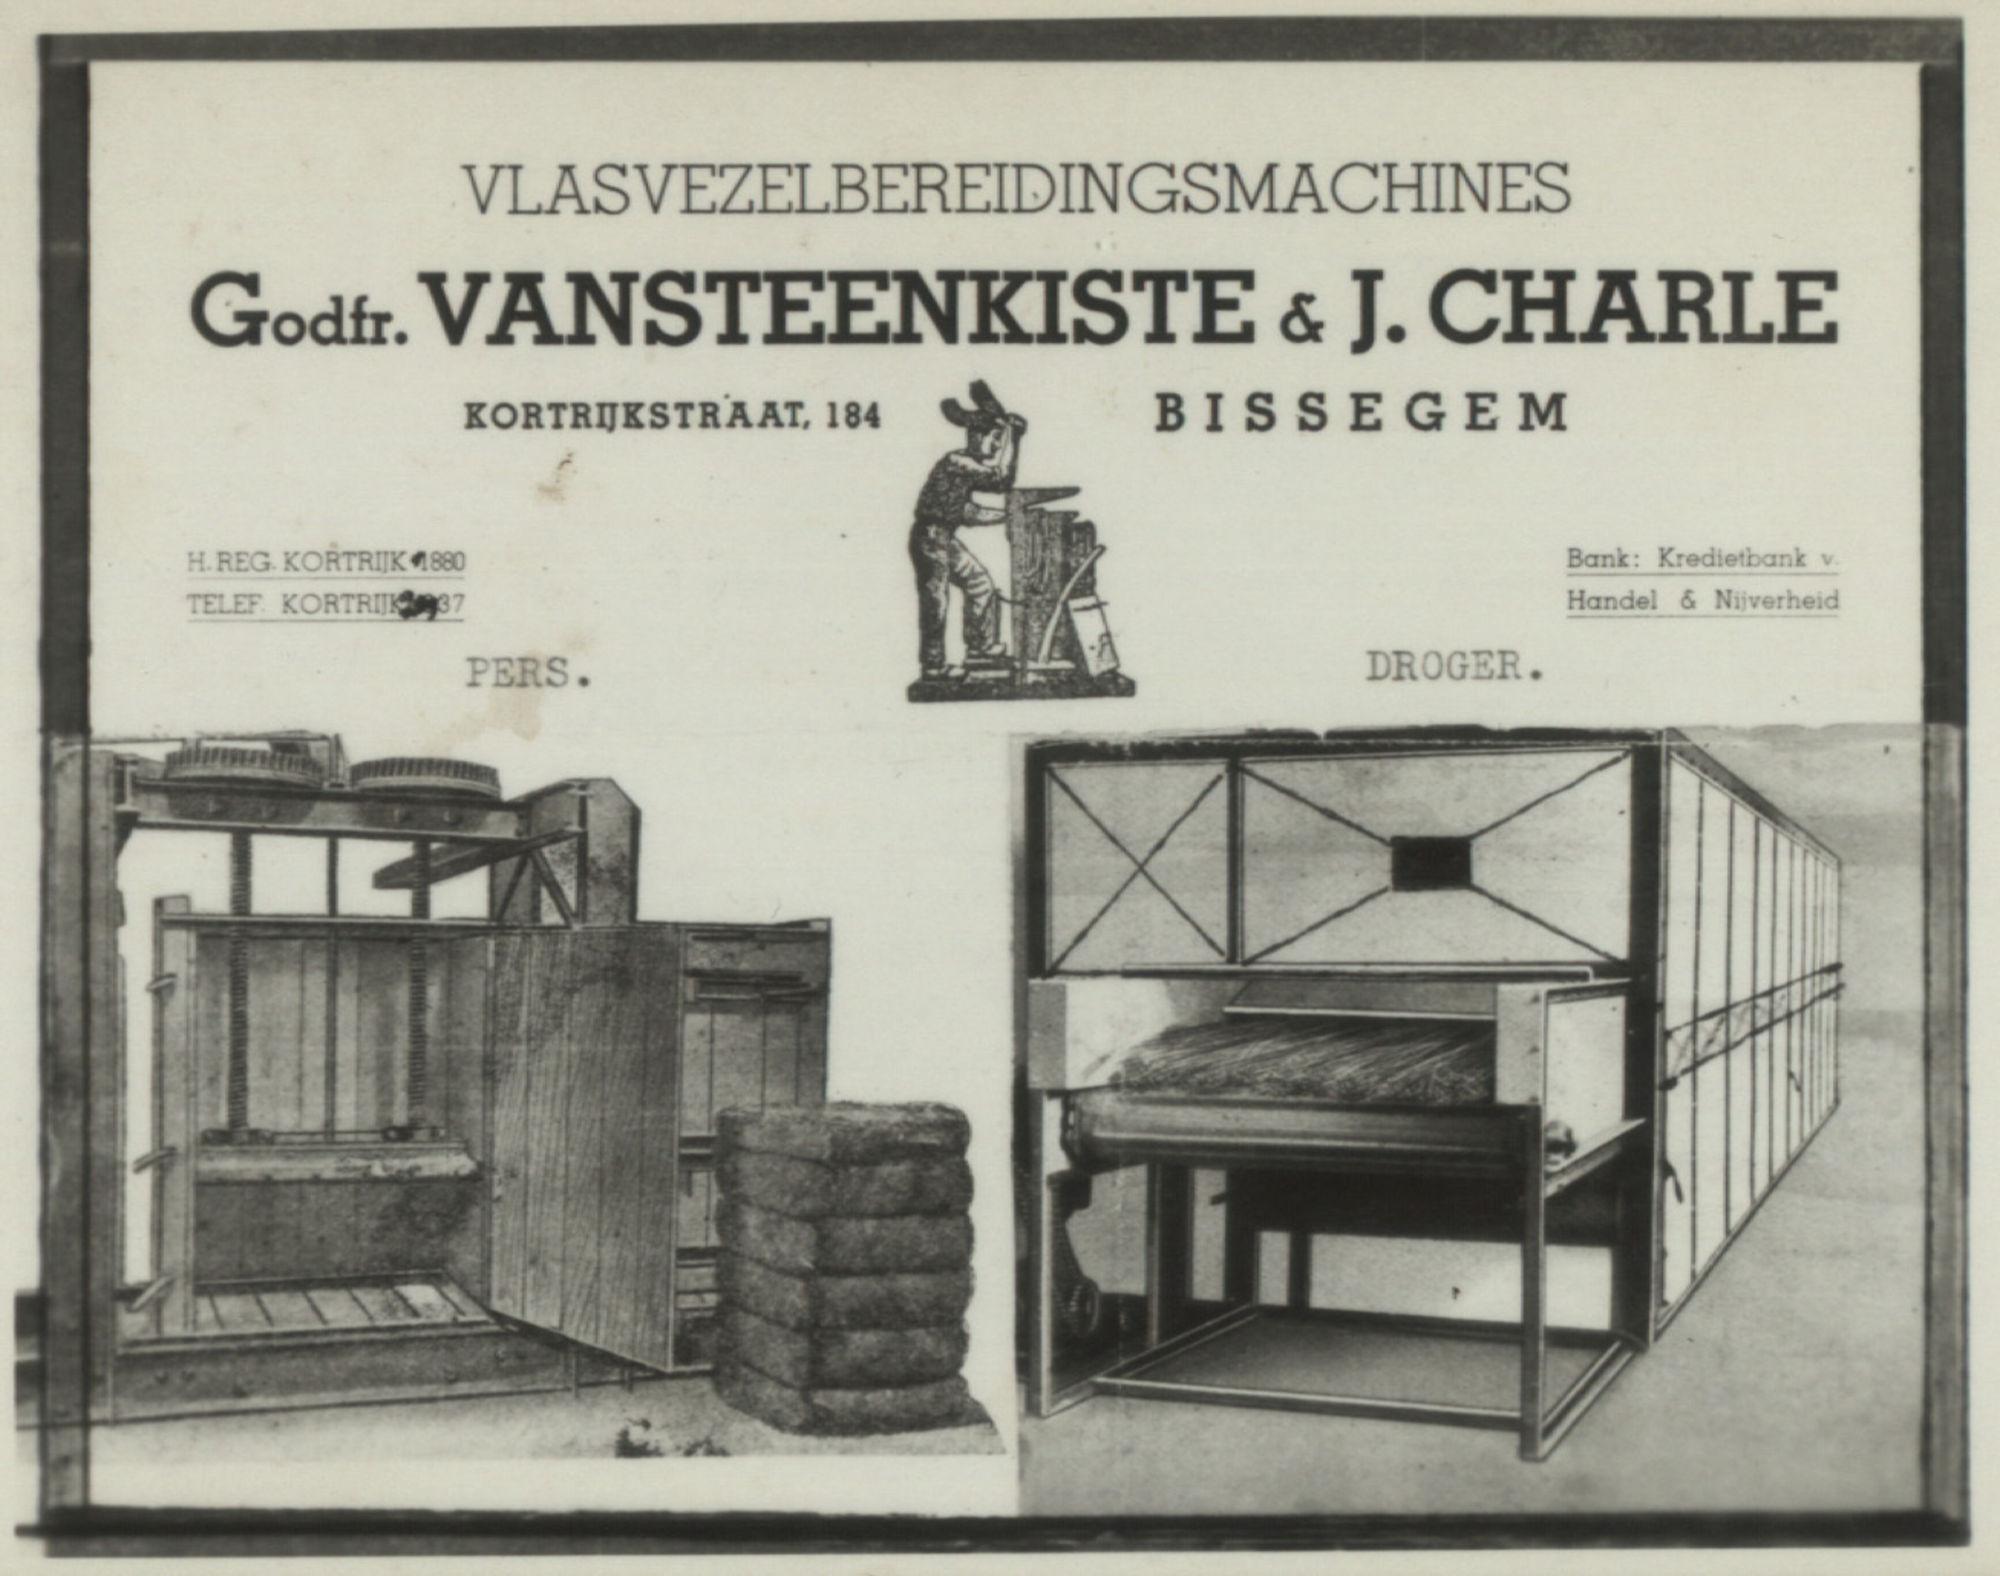 Vlasvezelbereidingsmachine Vansteenkiste & Charle